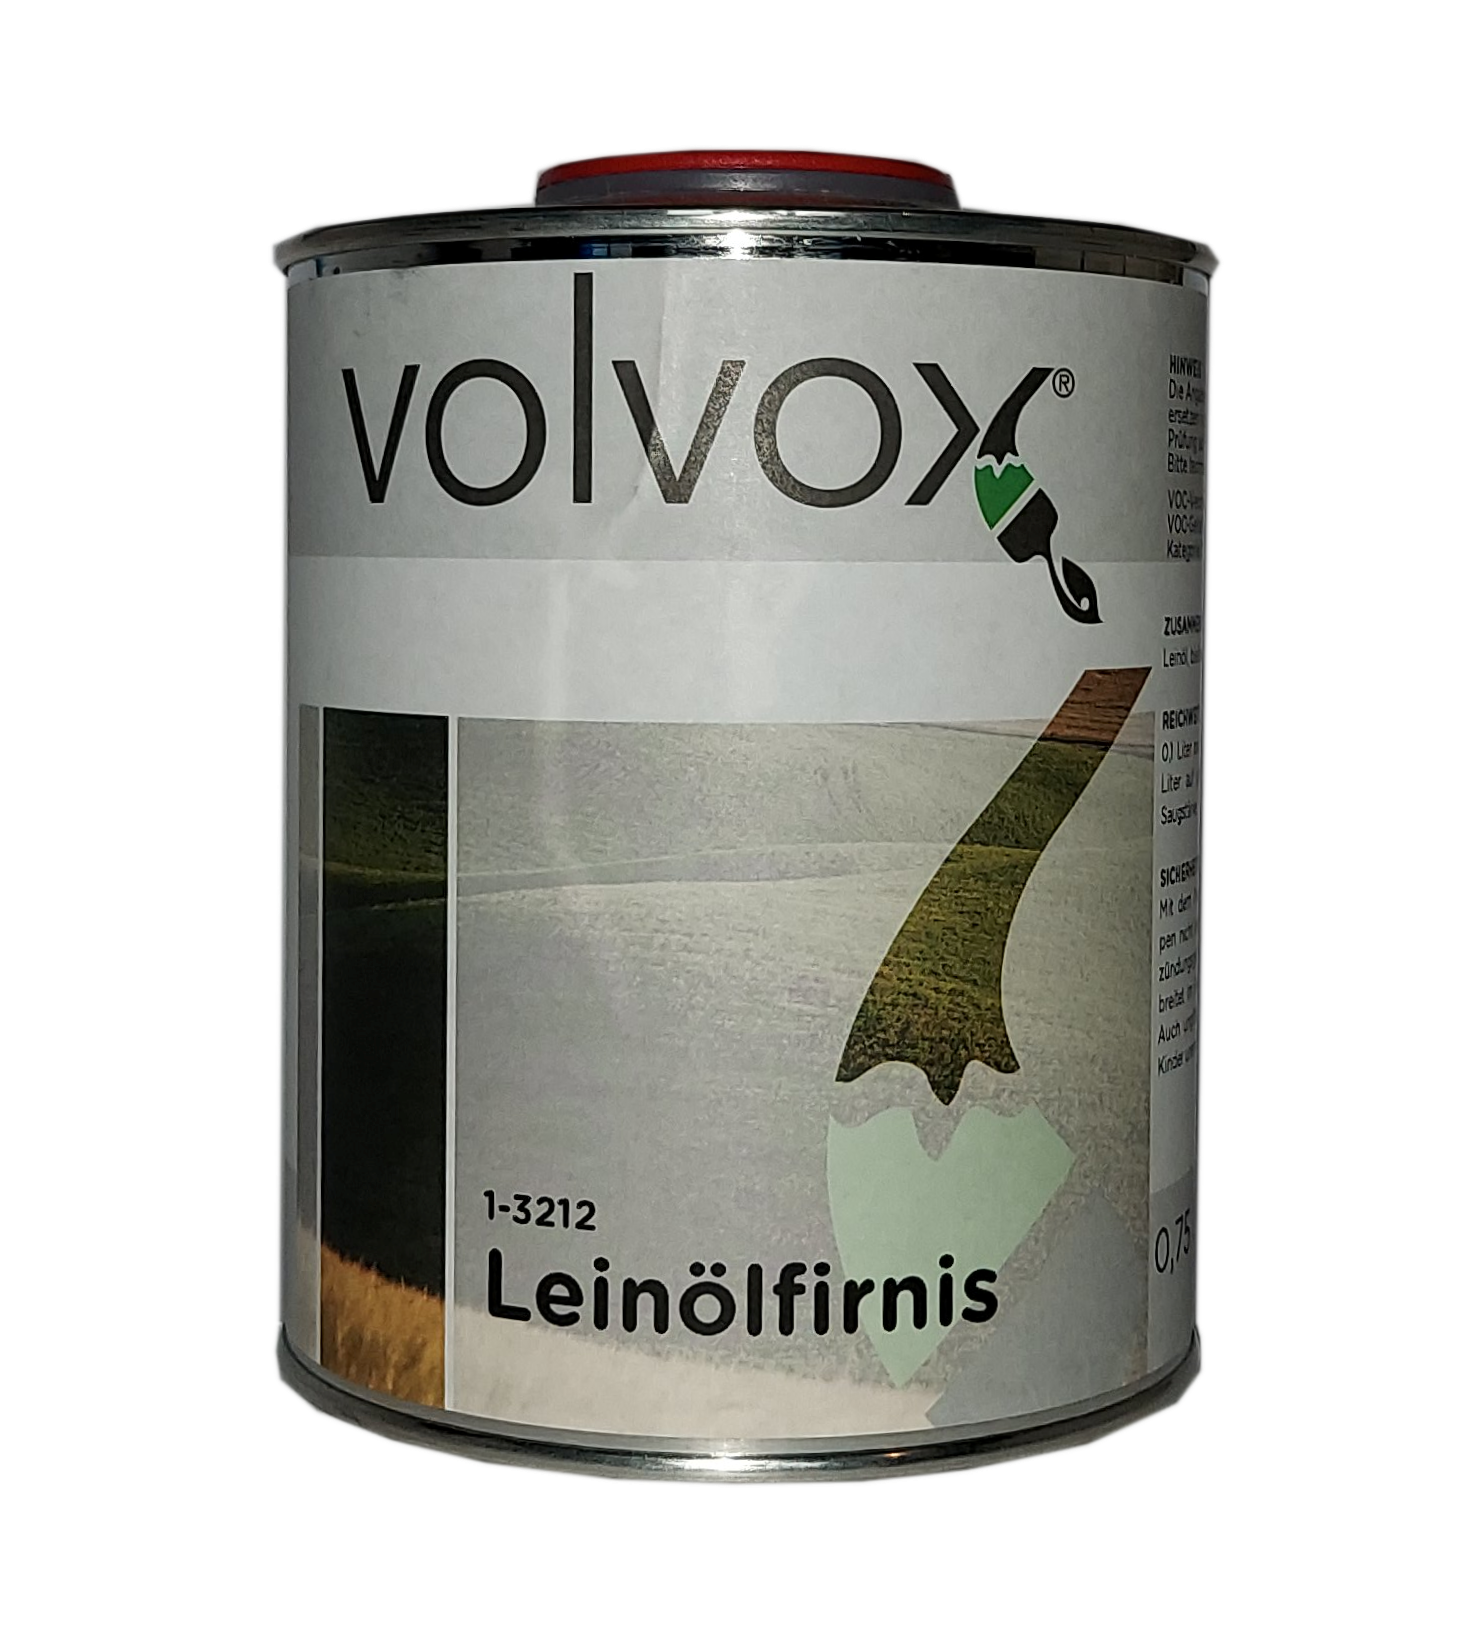 Volvox Leinölfirnis